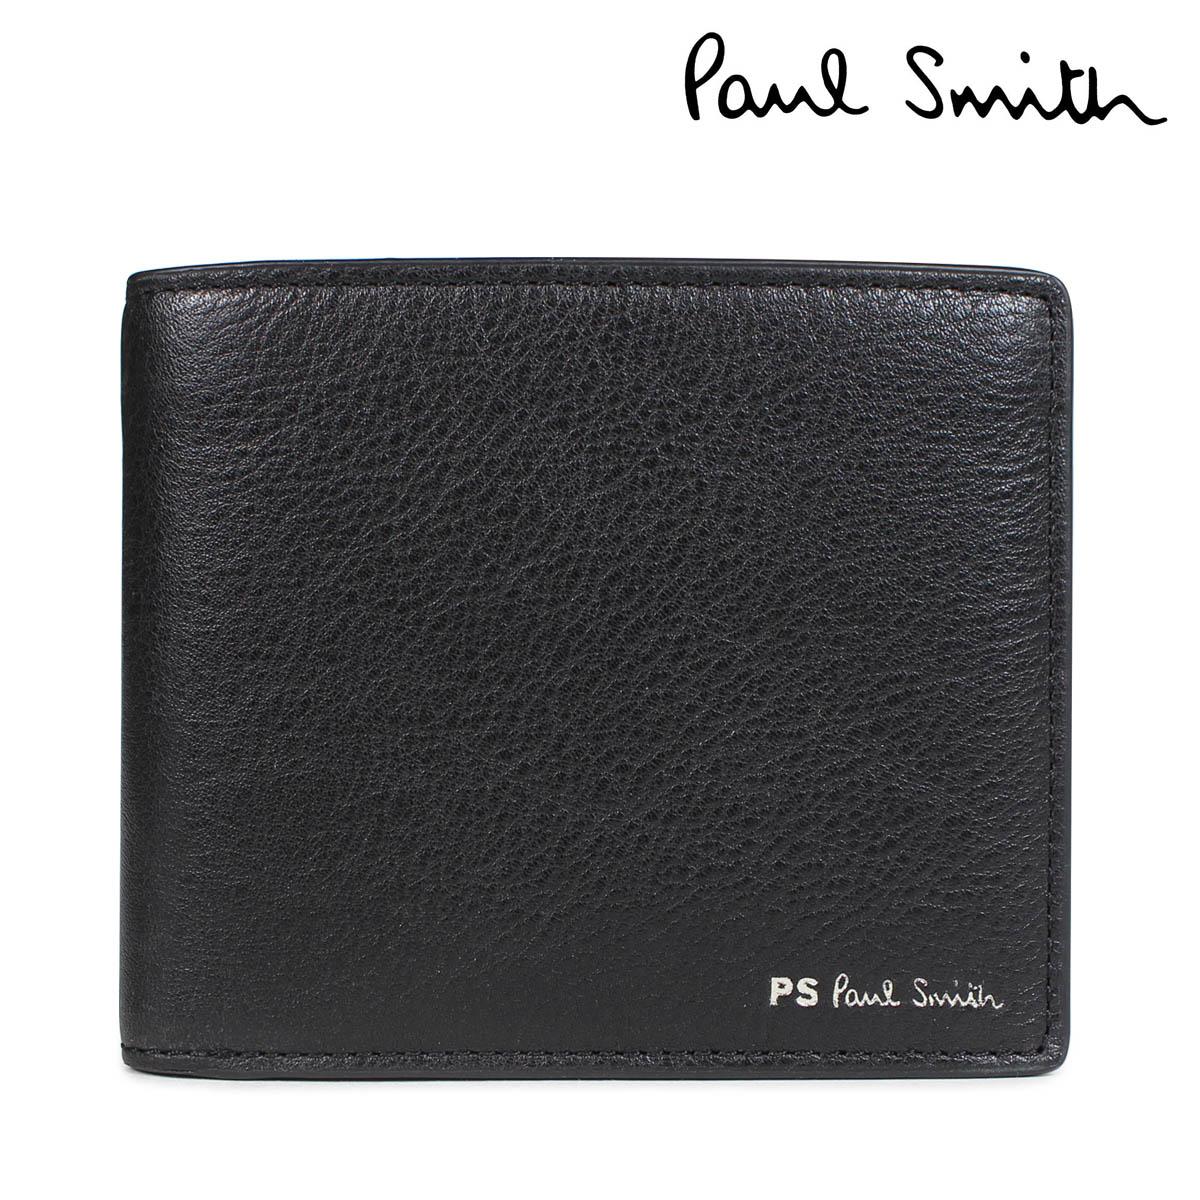 Paul Smith 財布 メンズ 二つ折り ポールスミス WALLET レザー ブラック M2A 5321 APSSTR [10/11 新入荷]